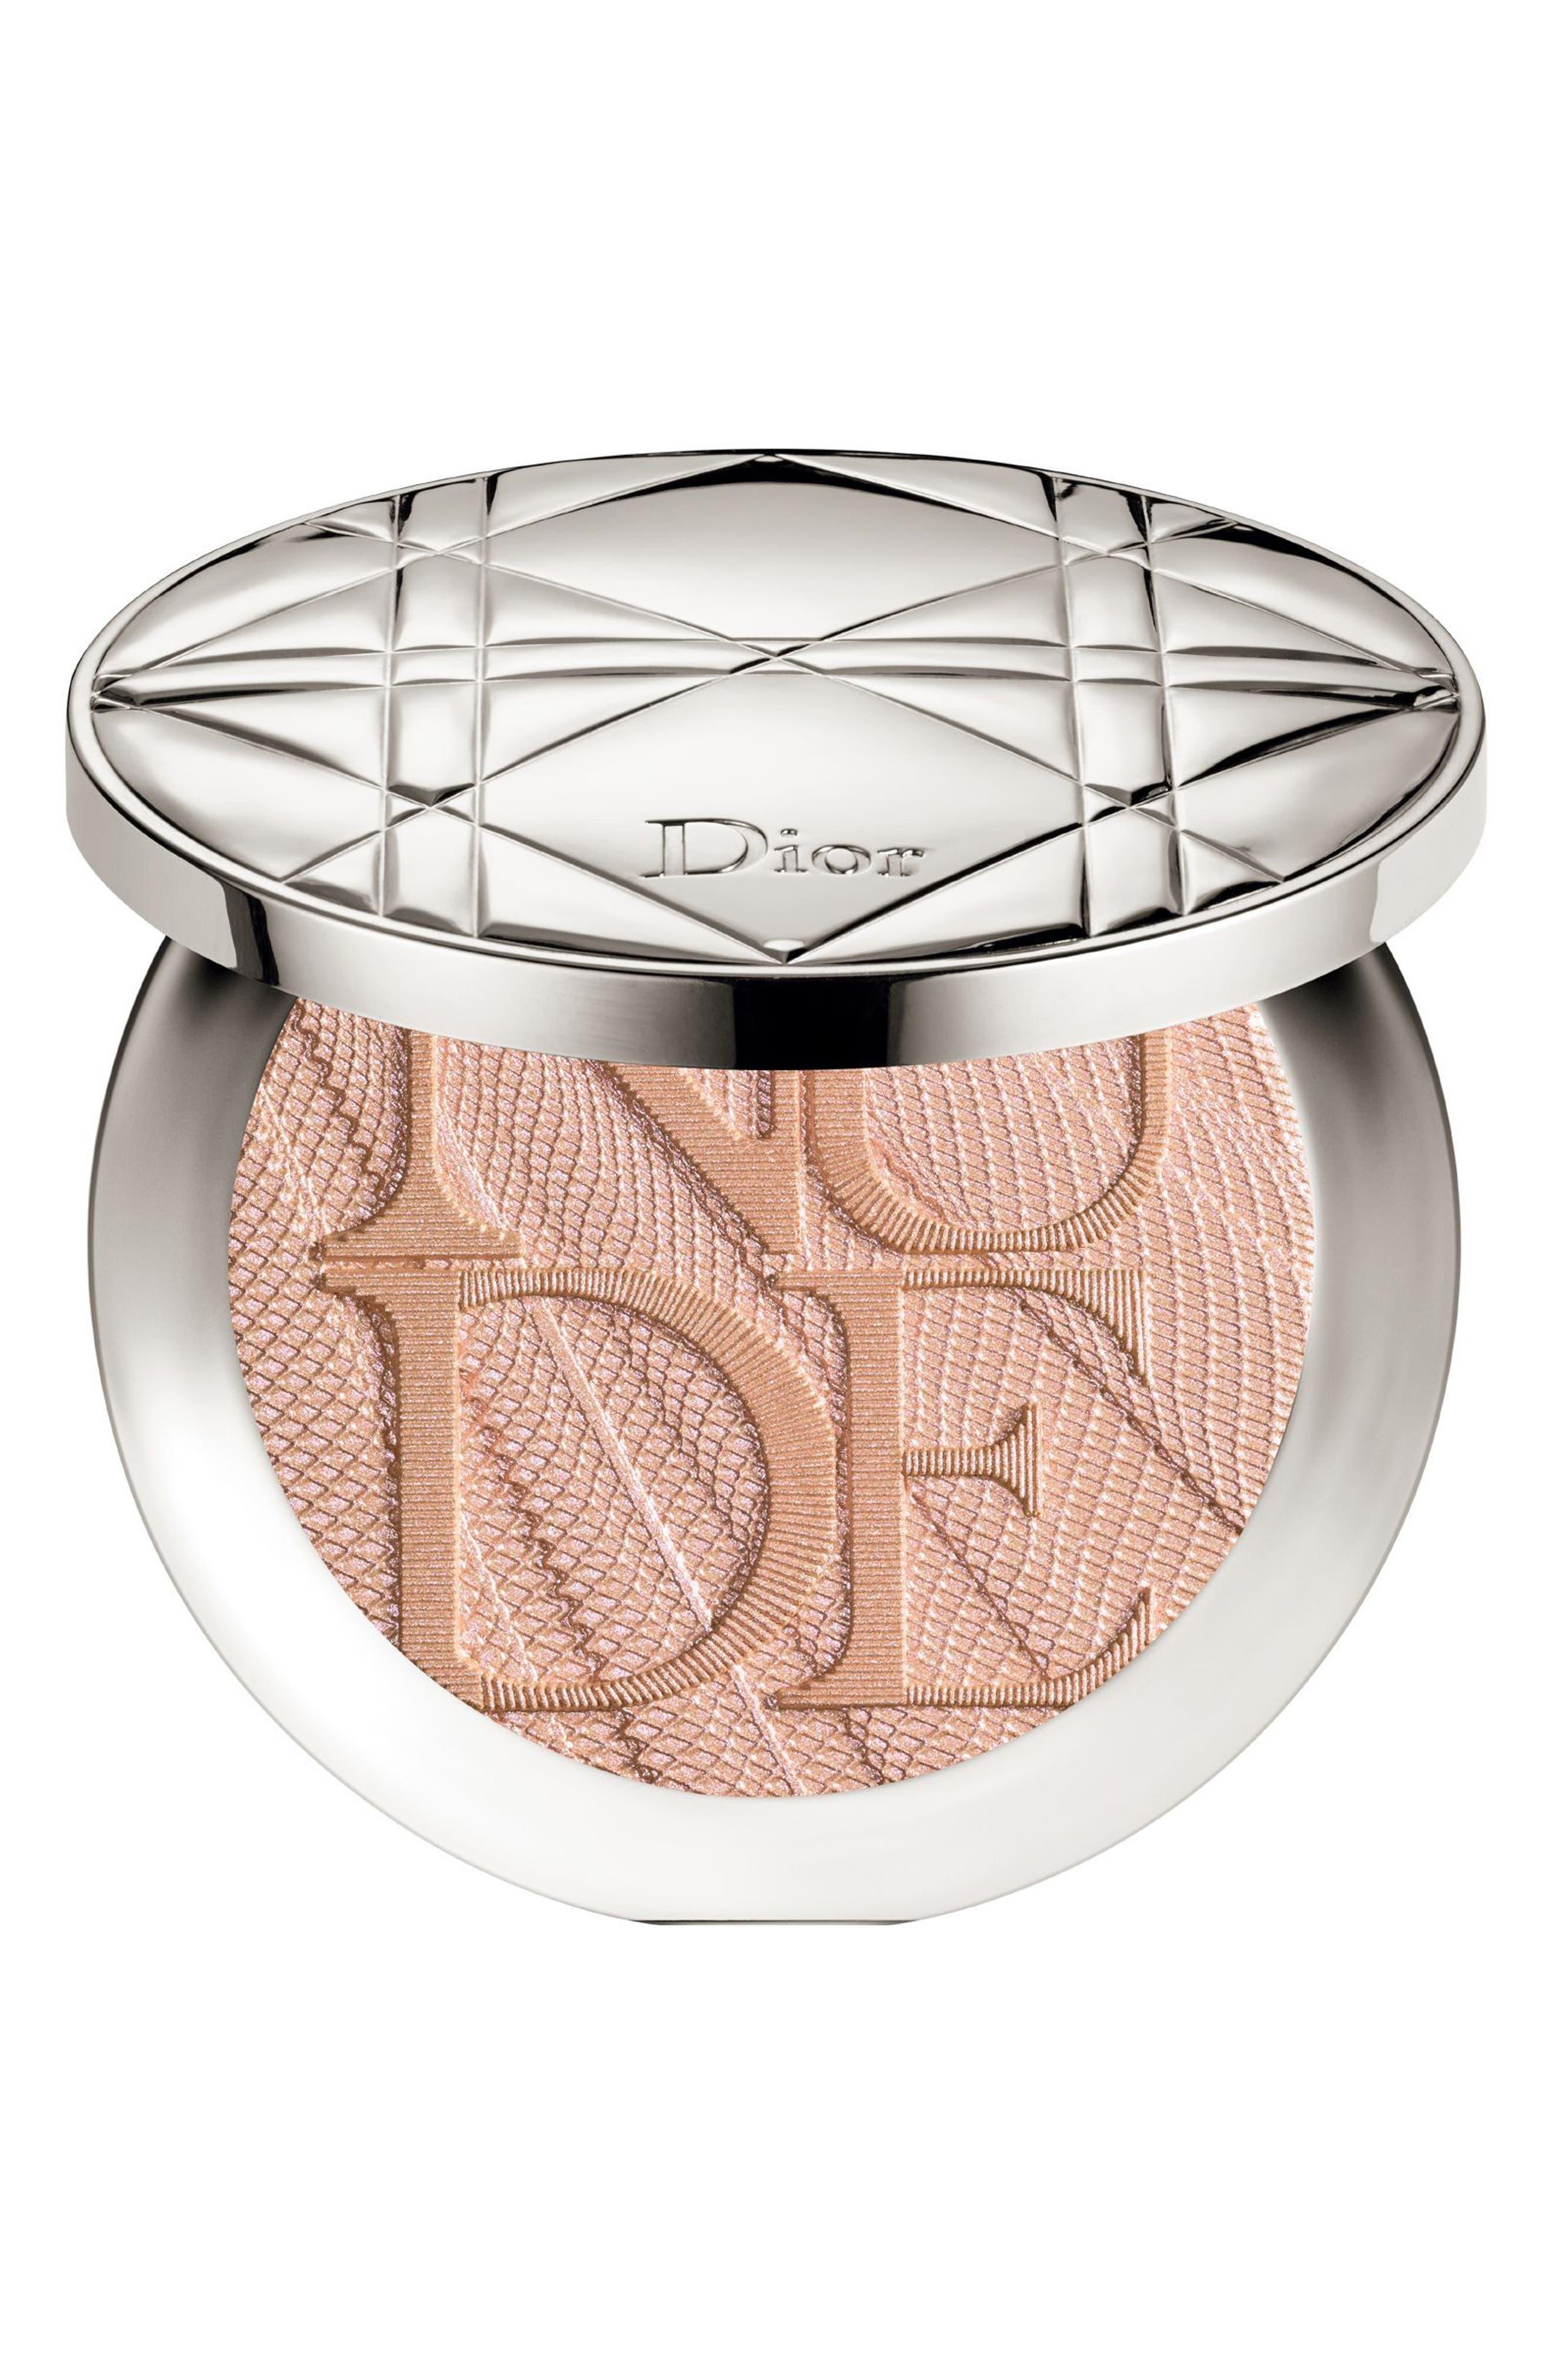 Dior Diorskin Nude Air Luminizer Glow Addict Holographic Sculpting Powder